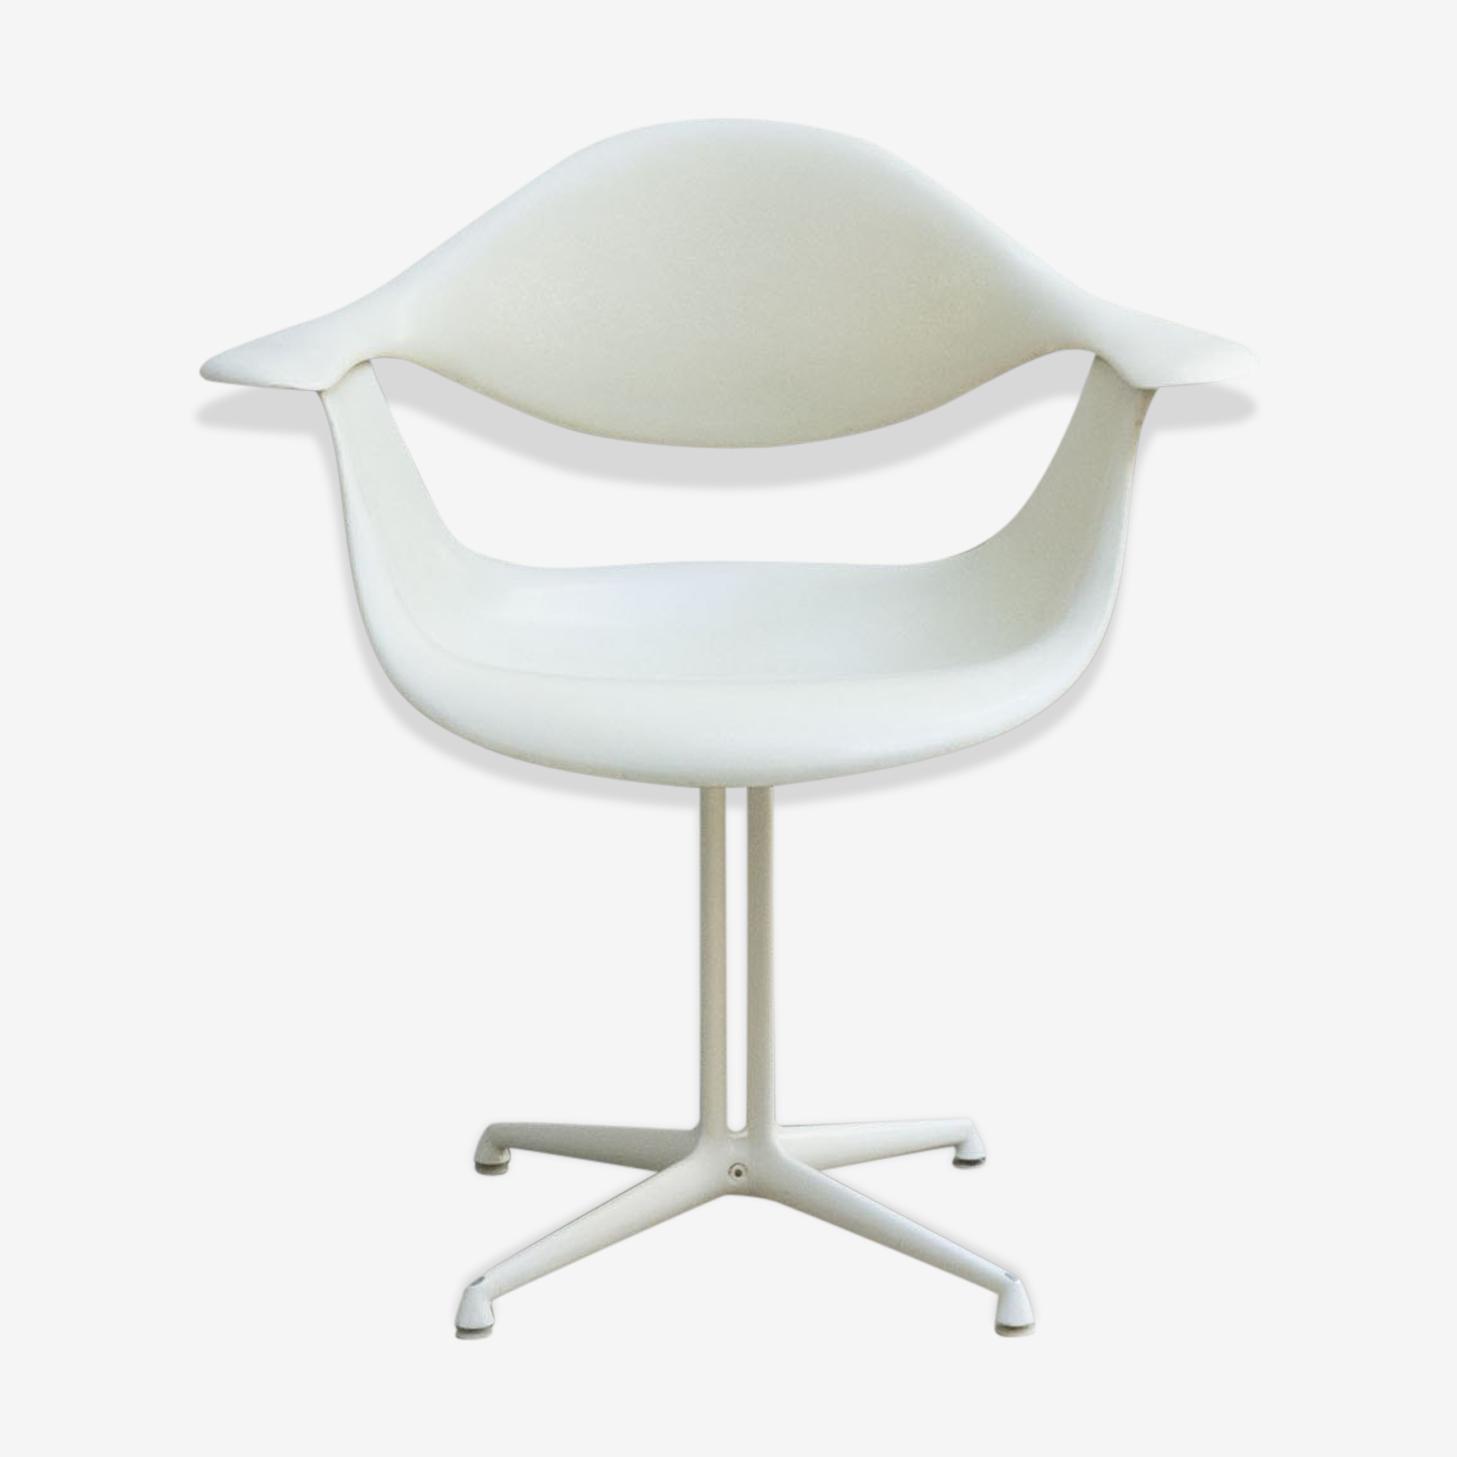 Swag Leg Chair de George Nelson DAF par Herman Miller